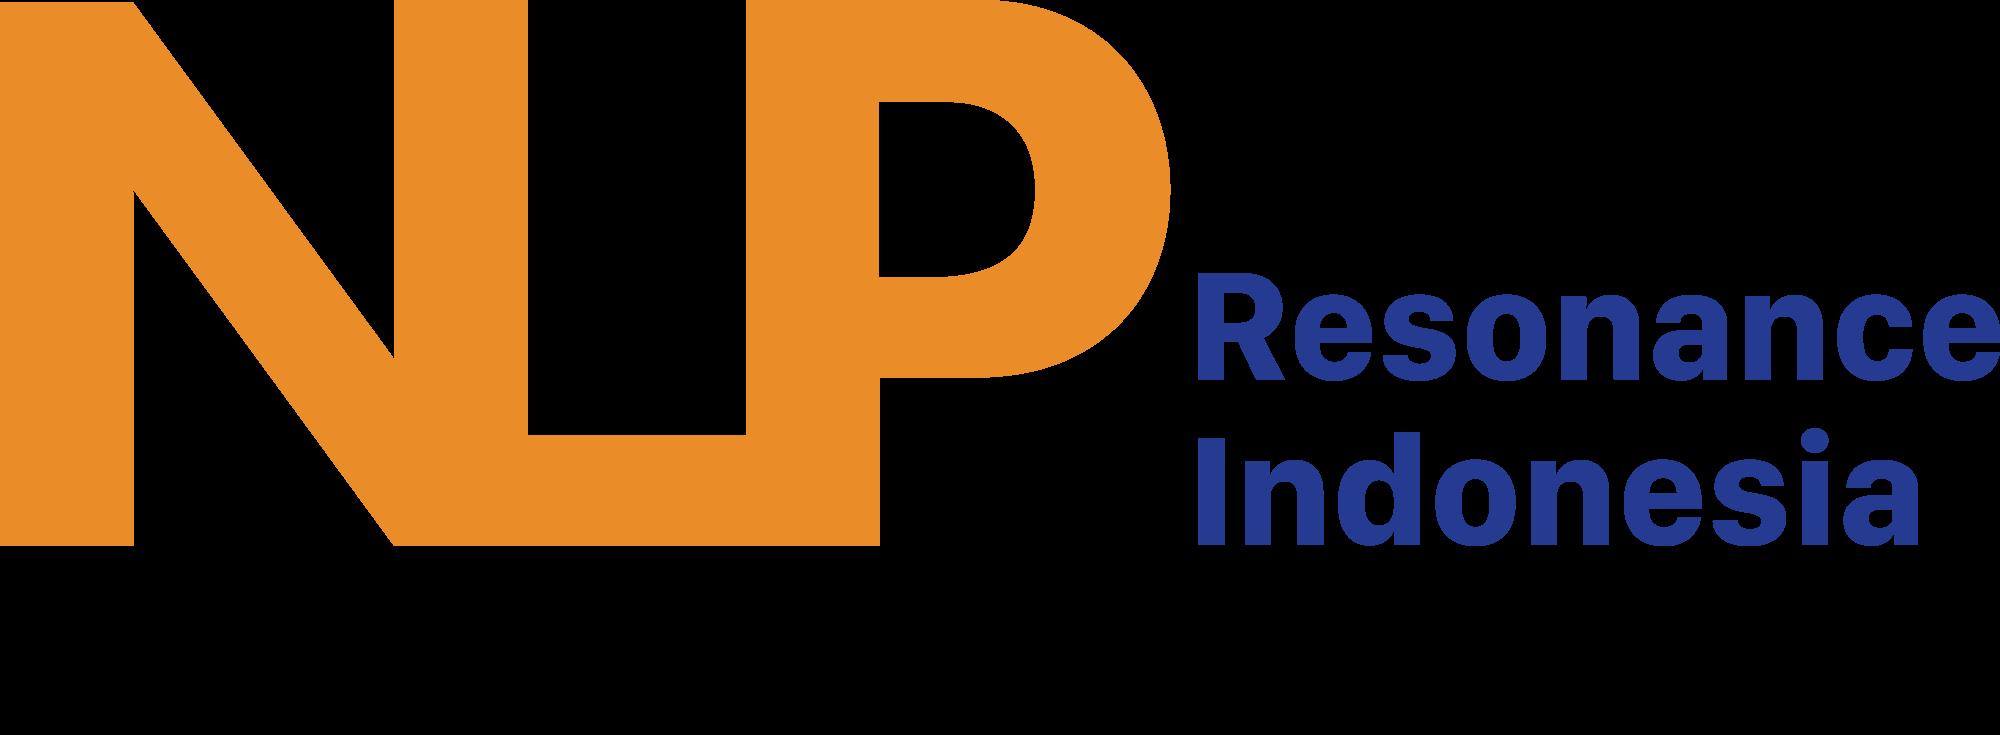 NLP Resonance Indonesia